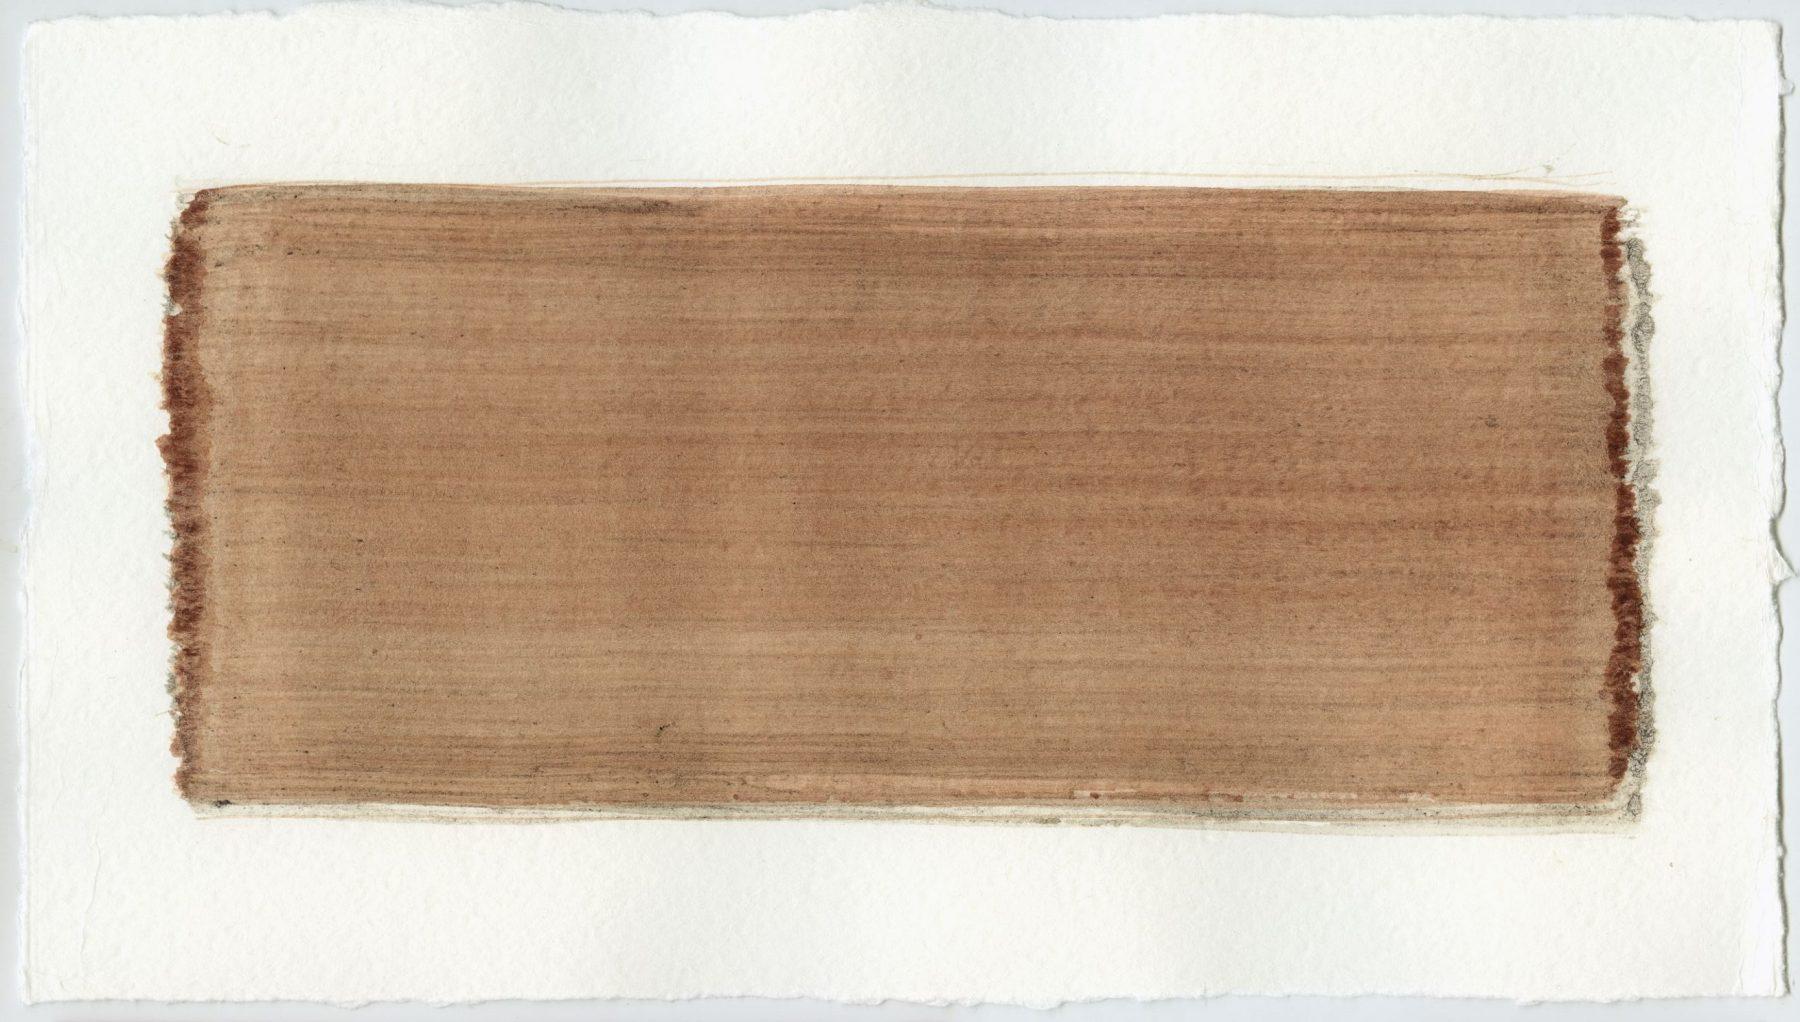 Brush stroke no. 104 - Selfmade pigment: Mortelse oker gebrand, Slingerpad bruin